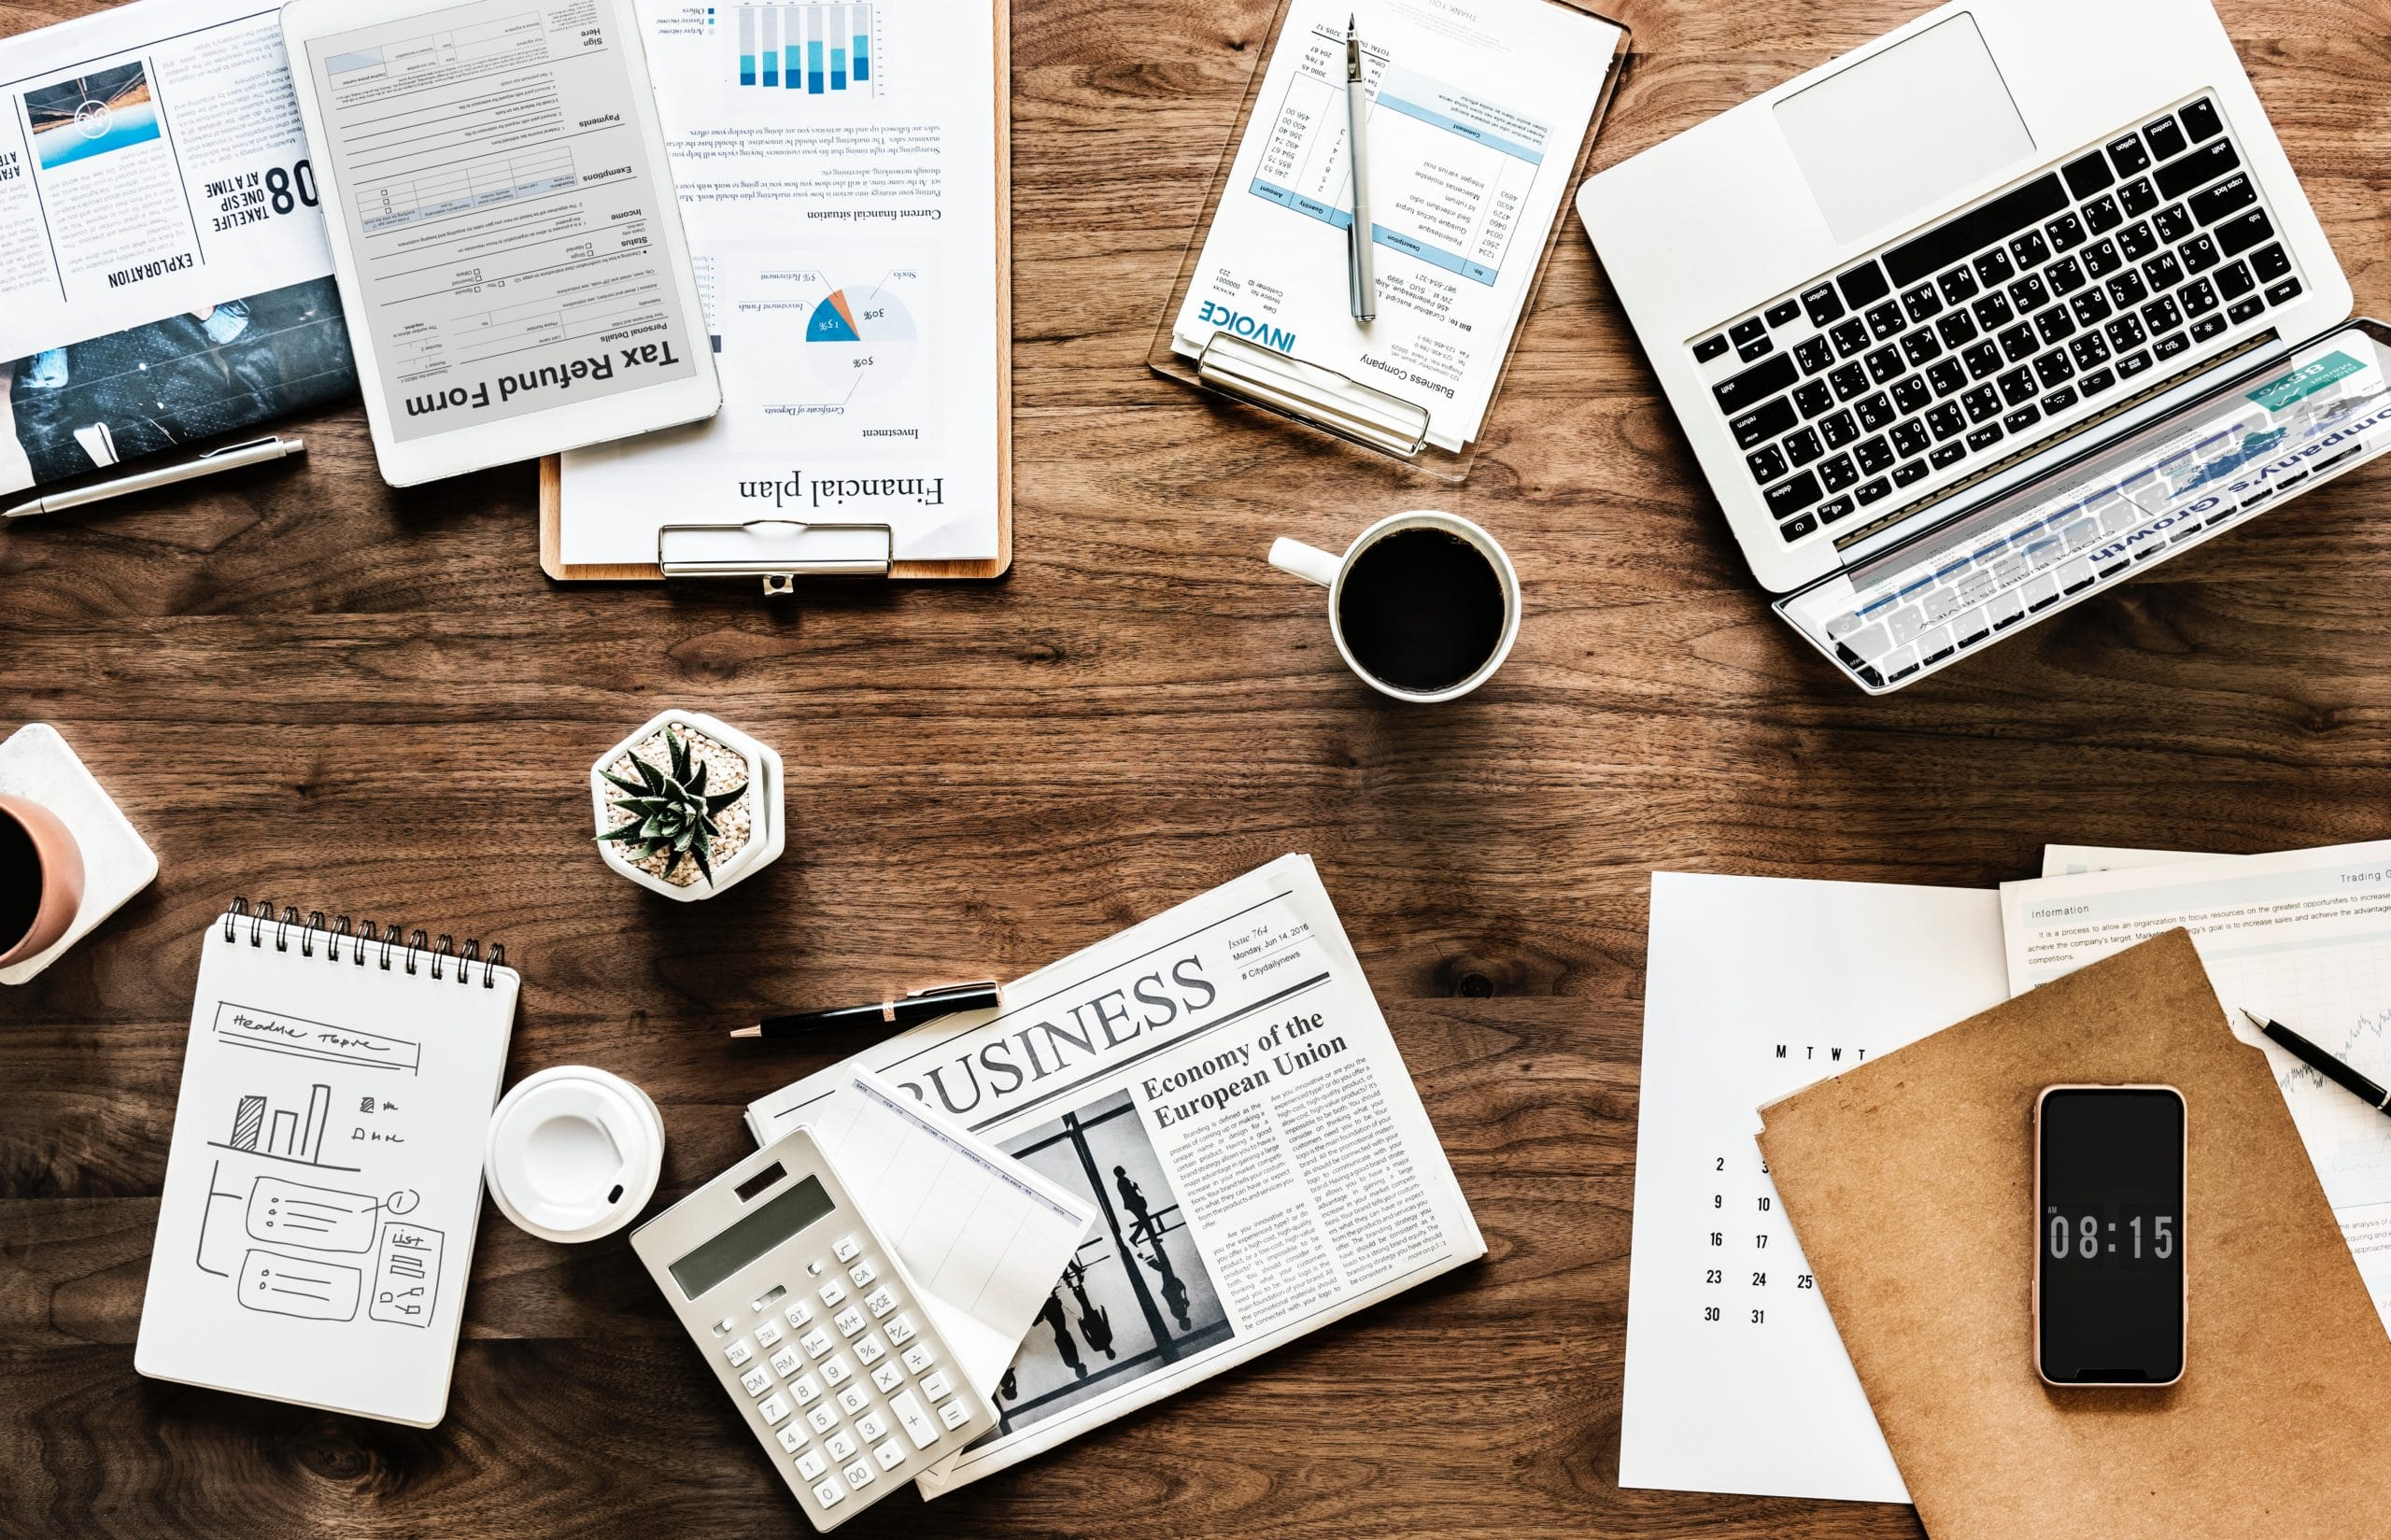 ISO 9001 requisitos: 7.1 – Recursos